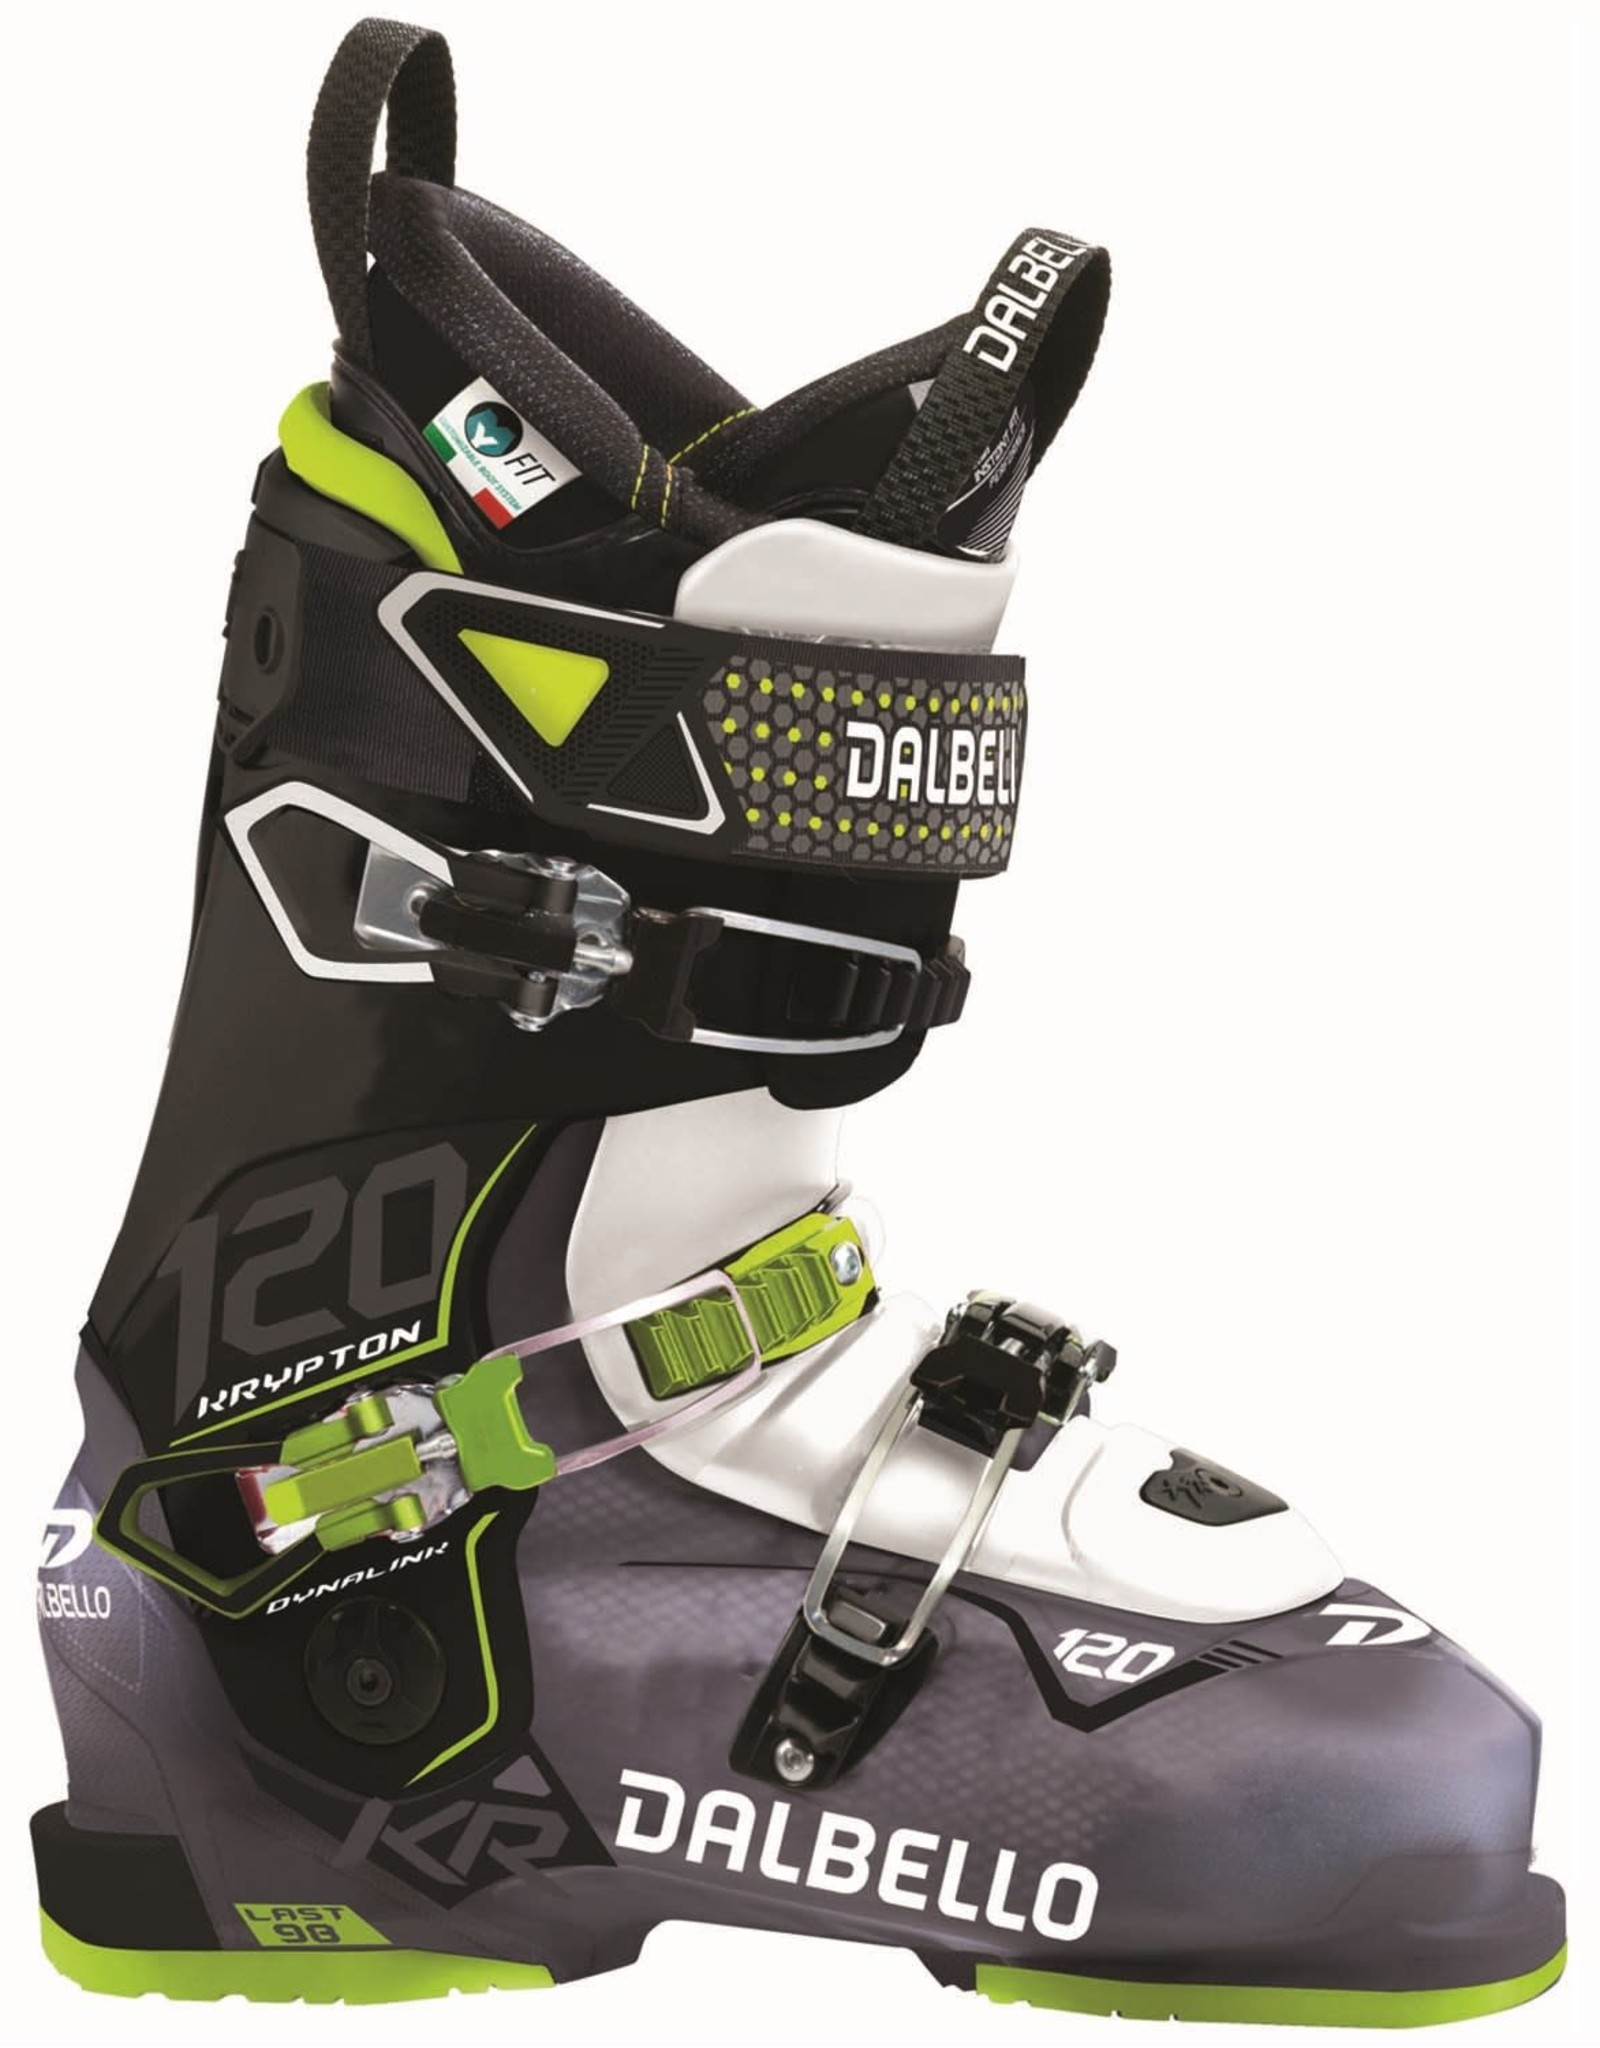 DALBELLO DALBELLO Ski Boots KRYPTON 120 (17/18)